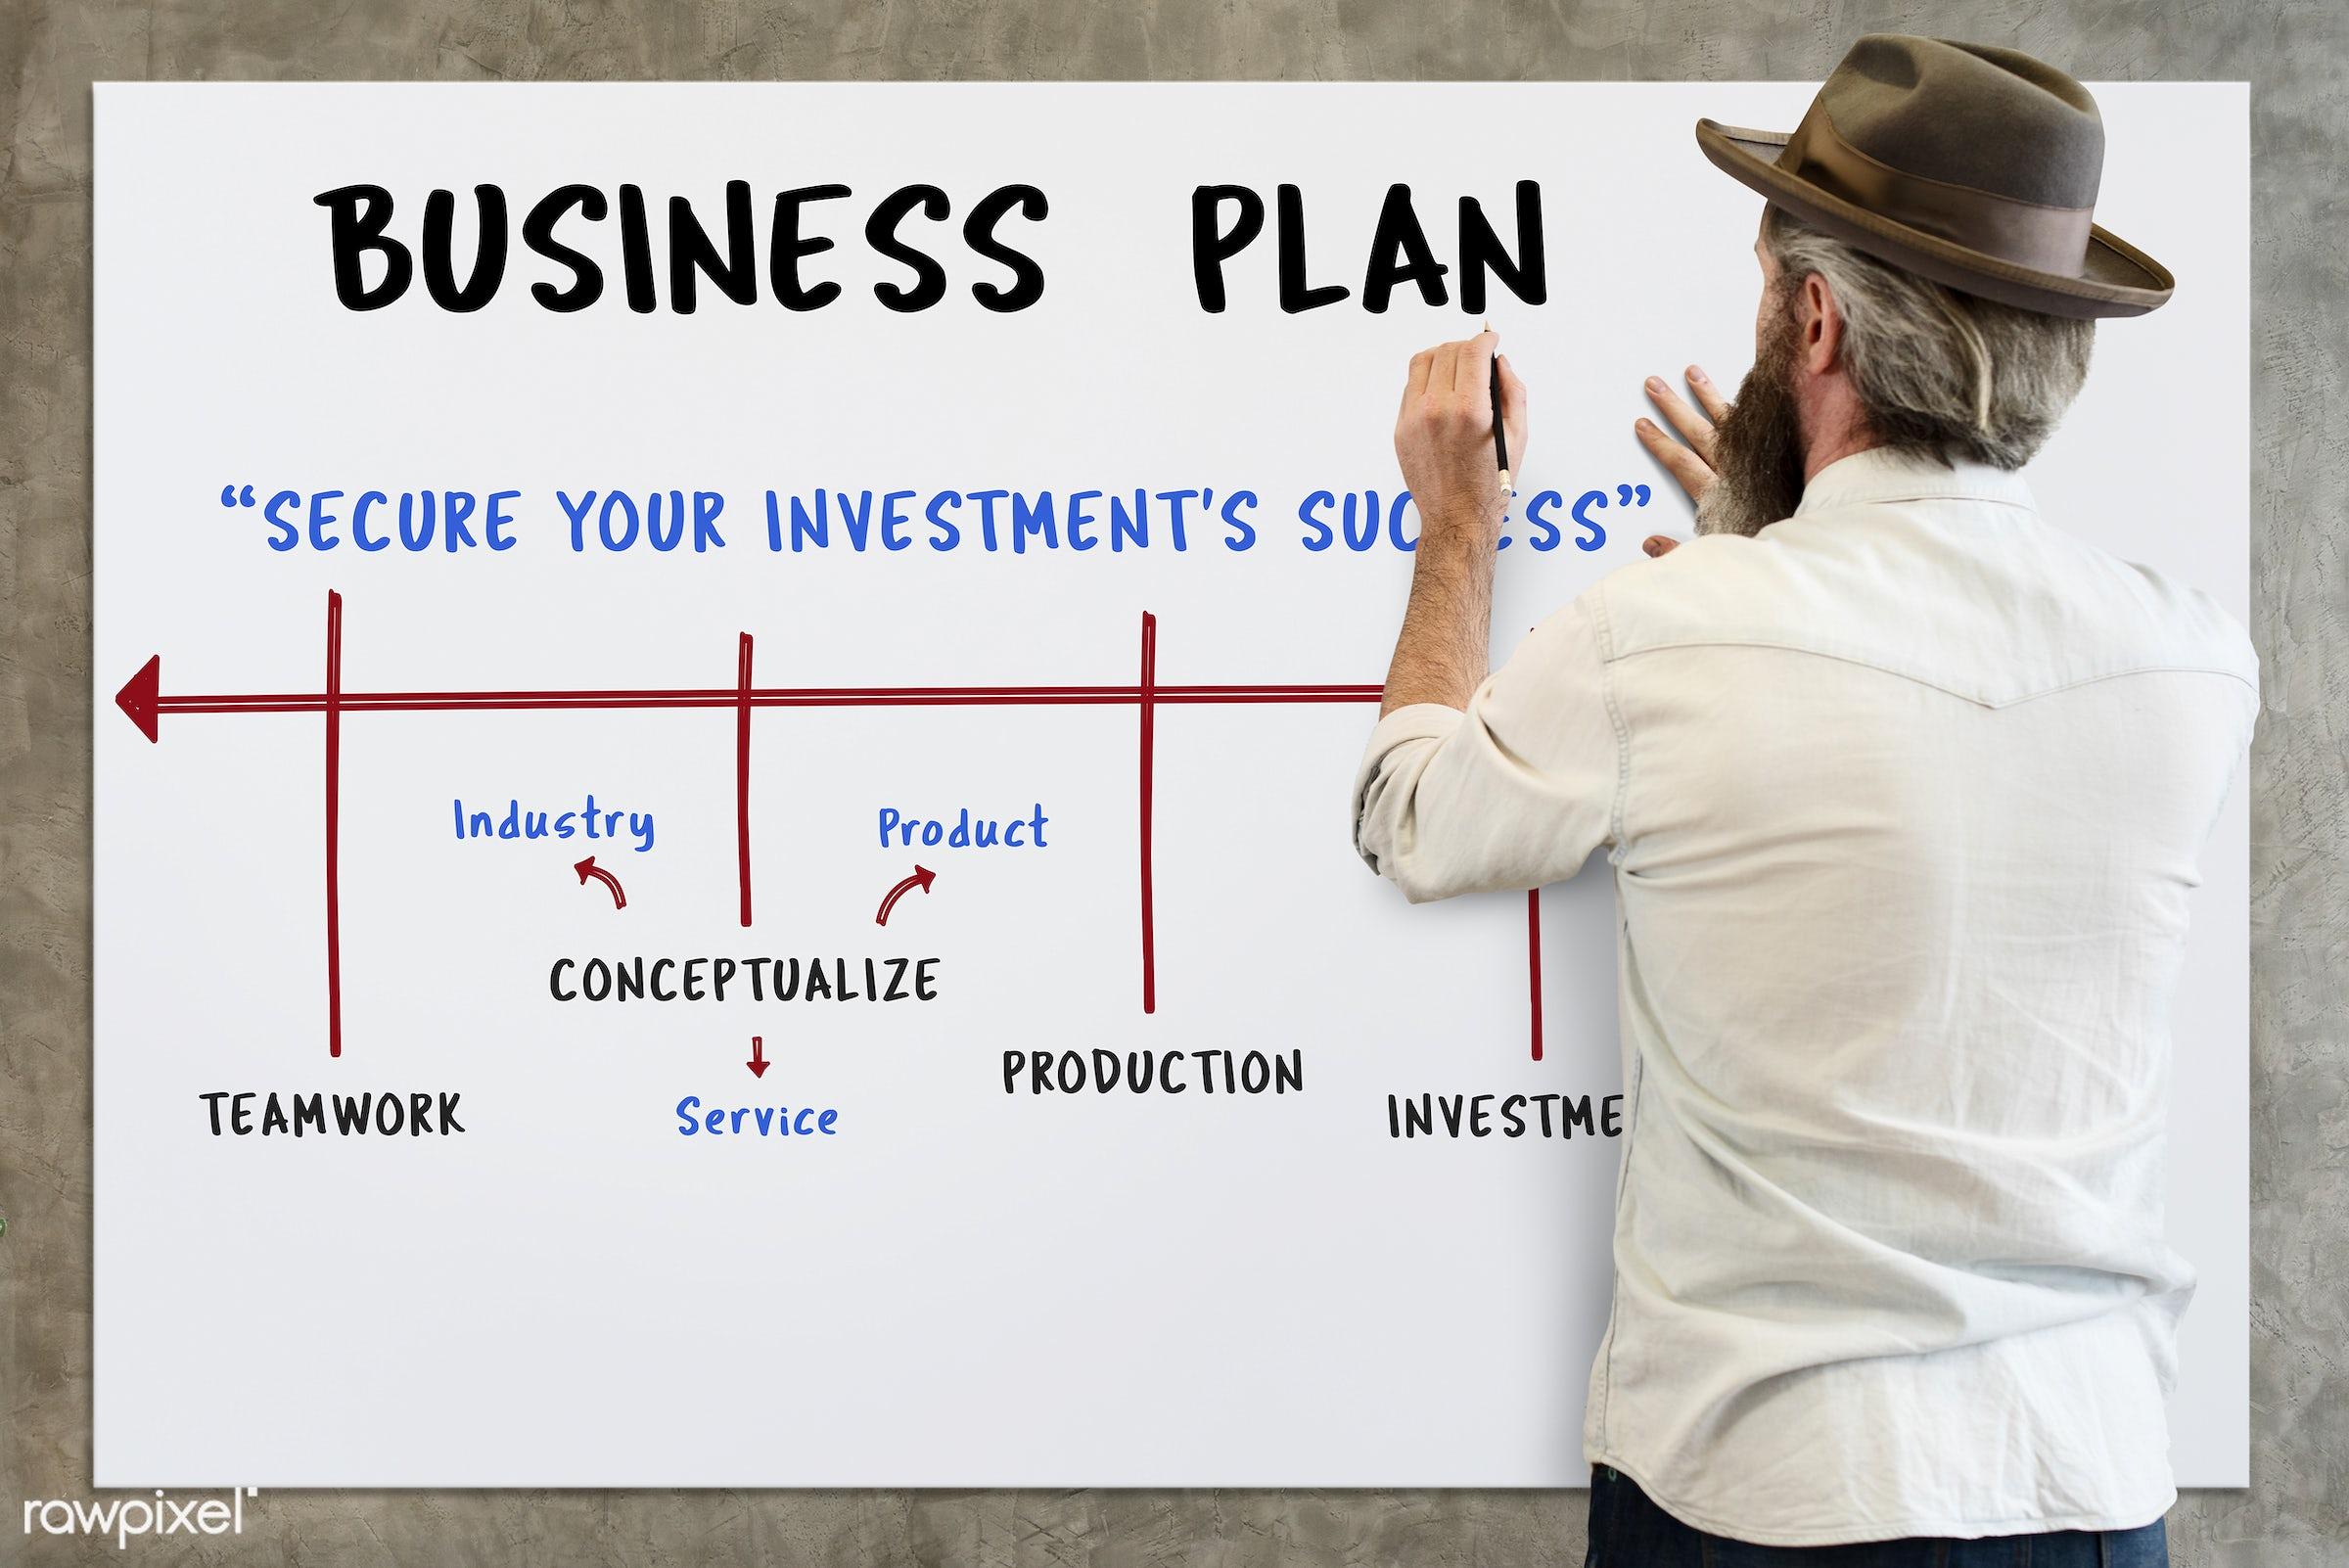 adult, alone, analysis, analytics, back, be creative, beard, beard guy, board, business, business plan, campaign, carefree,...